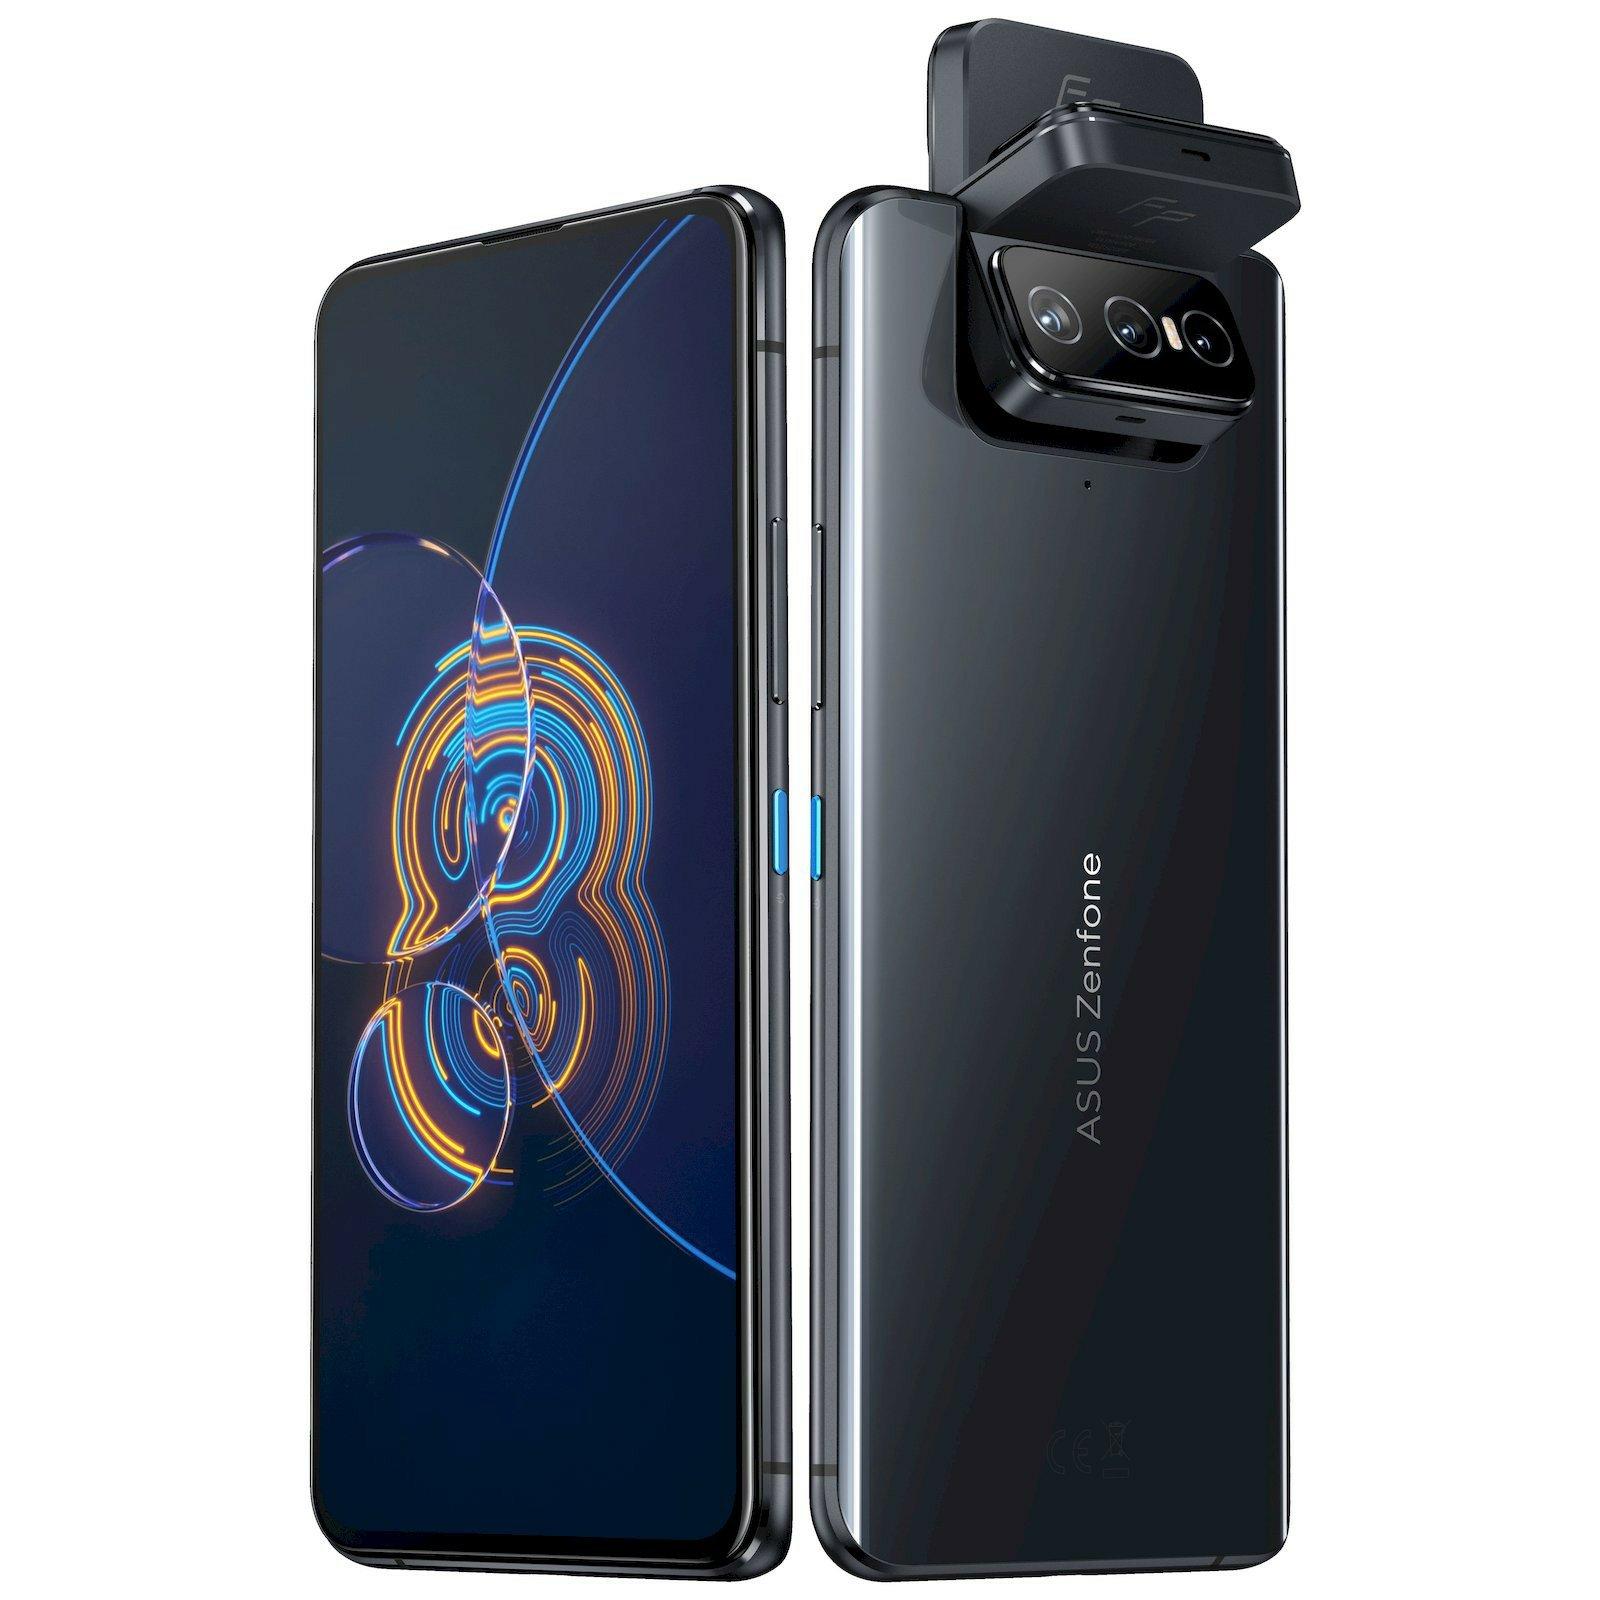 Asus ZenFone 8 Flip Price and Specifications